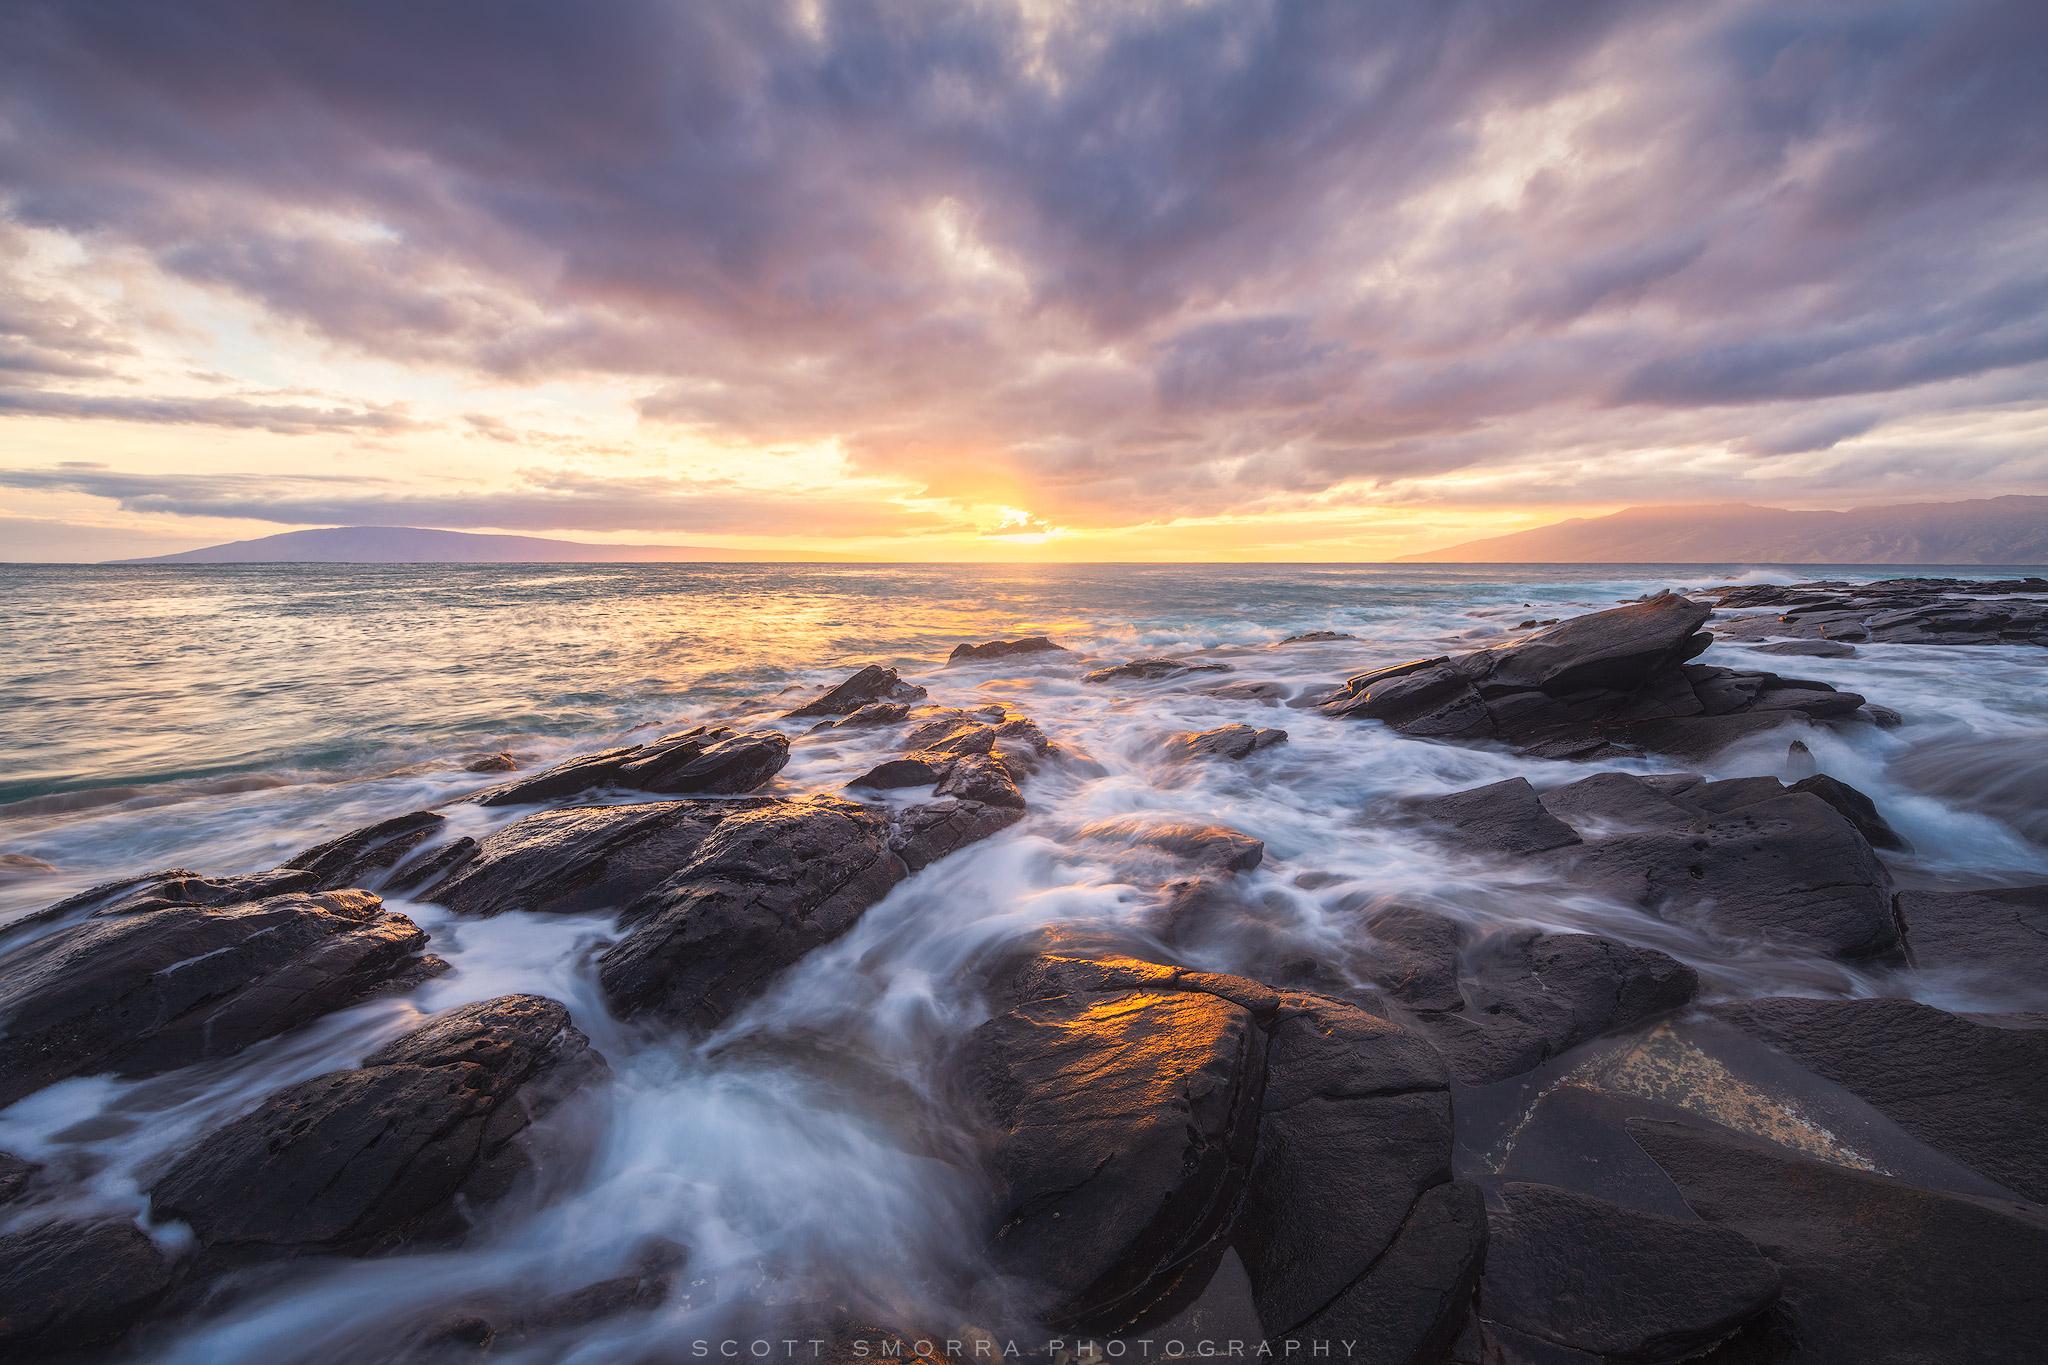 Hawaii, Maui, Kapalua, sunset, rocks, waves, shoreline, islands, Molokai, Lanai,, photo